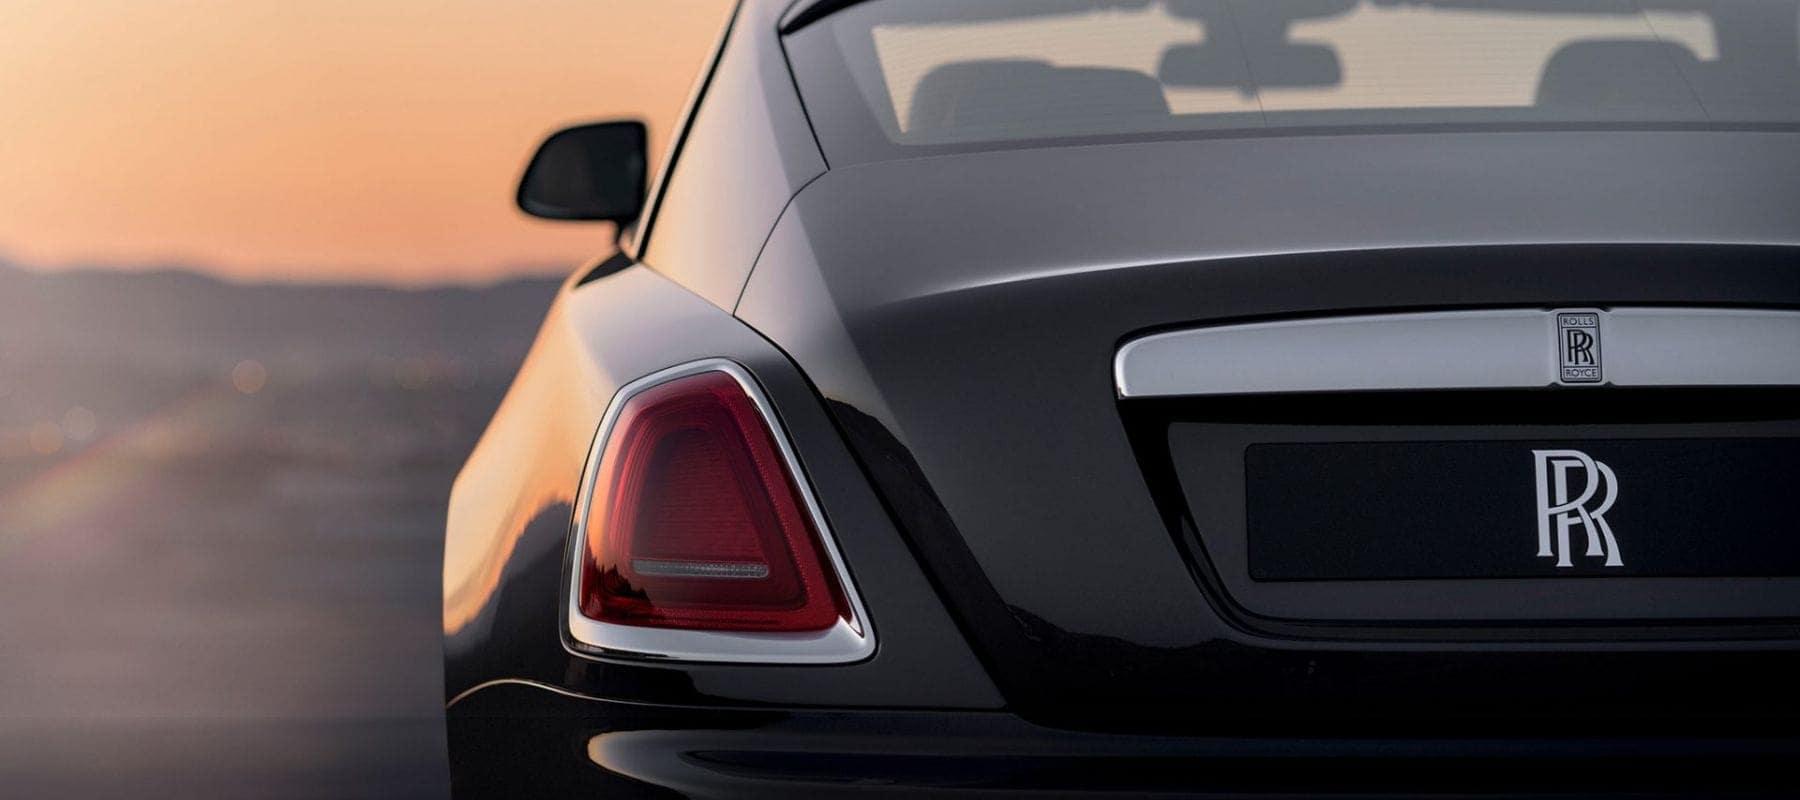 2019 Rolls Royce WRAITH W1714INTERIORSjpgrr1920MEDjpg